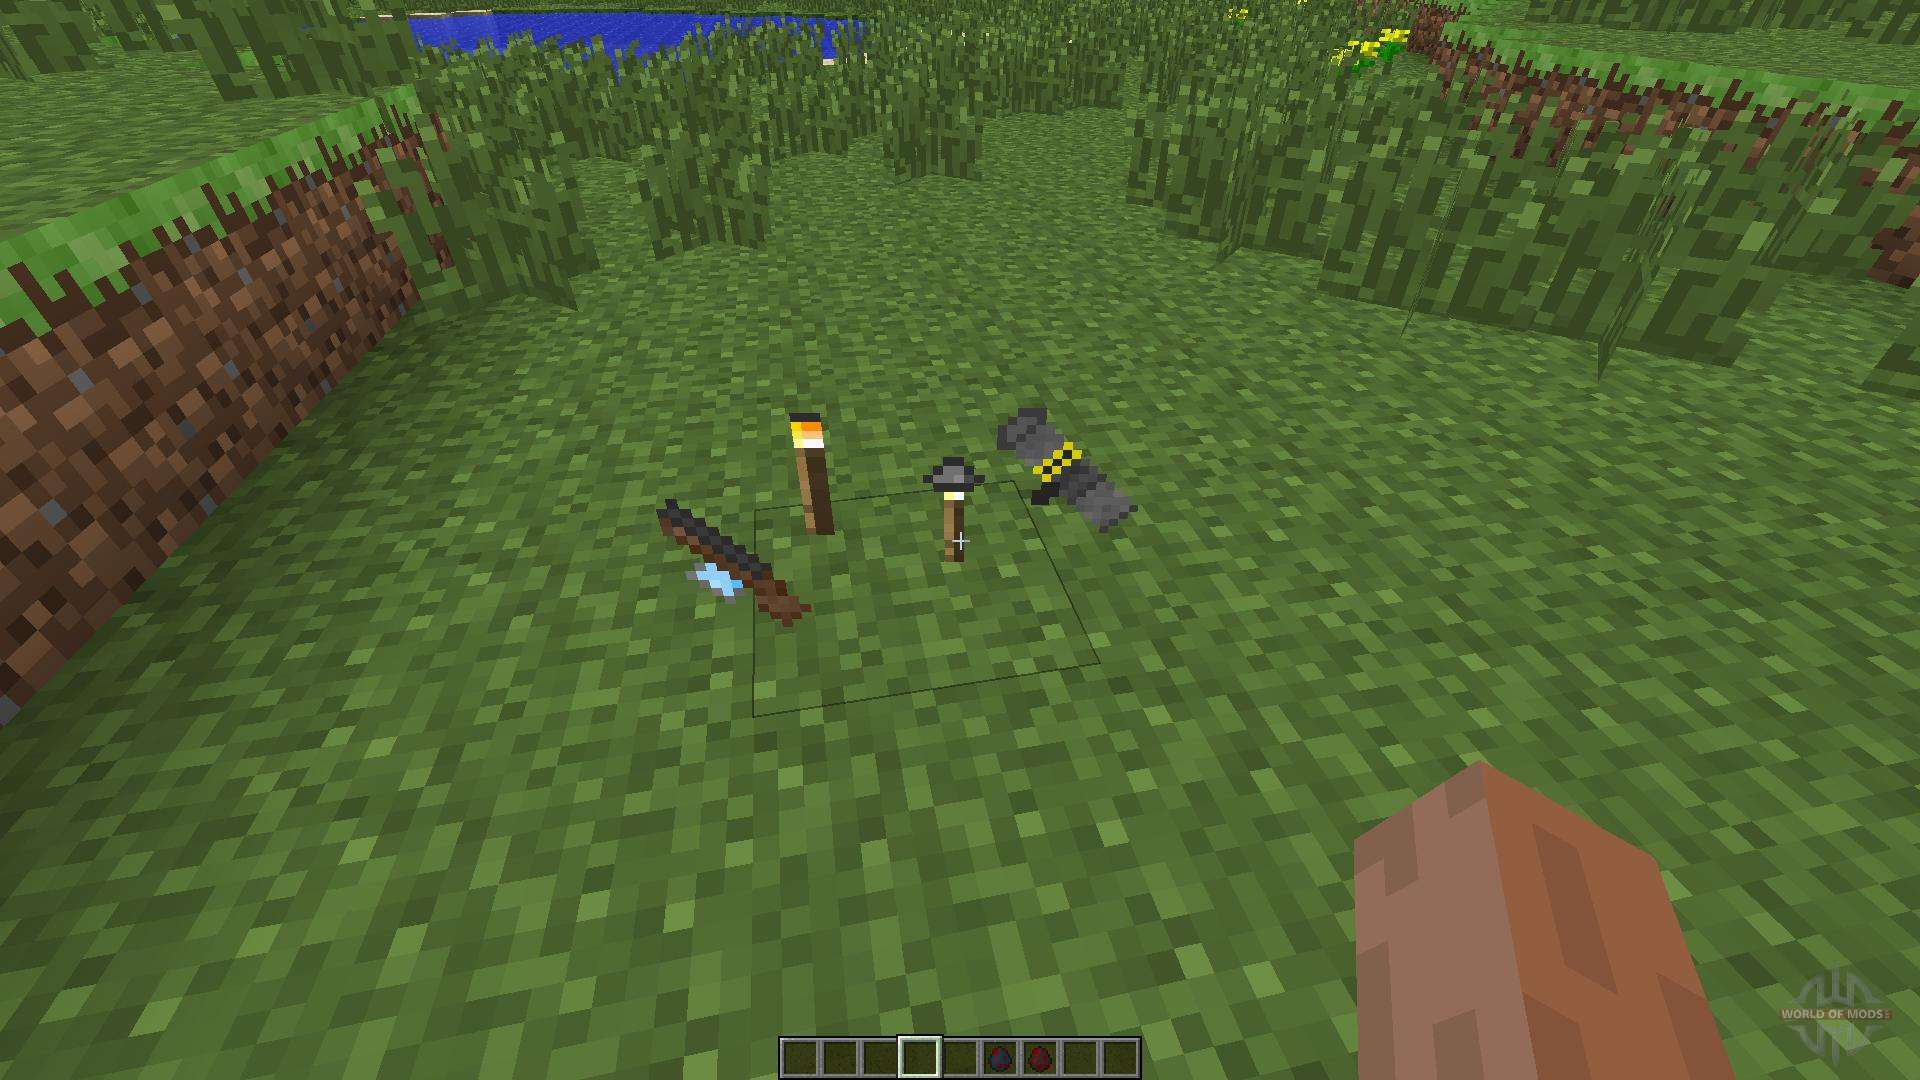 minecraft torched mod 1.6.2